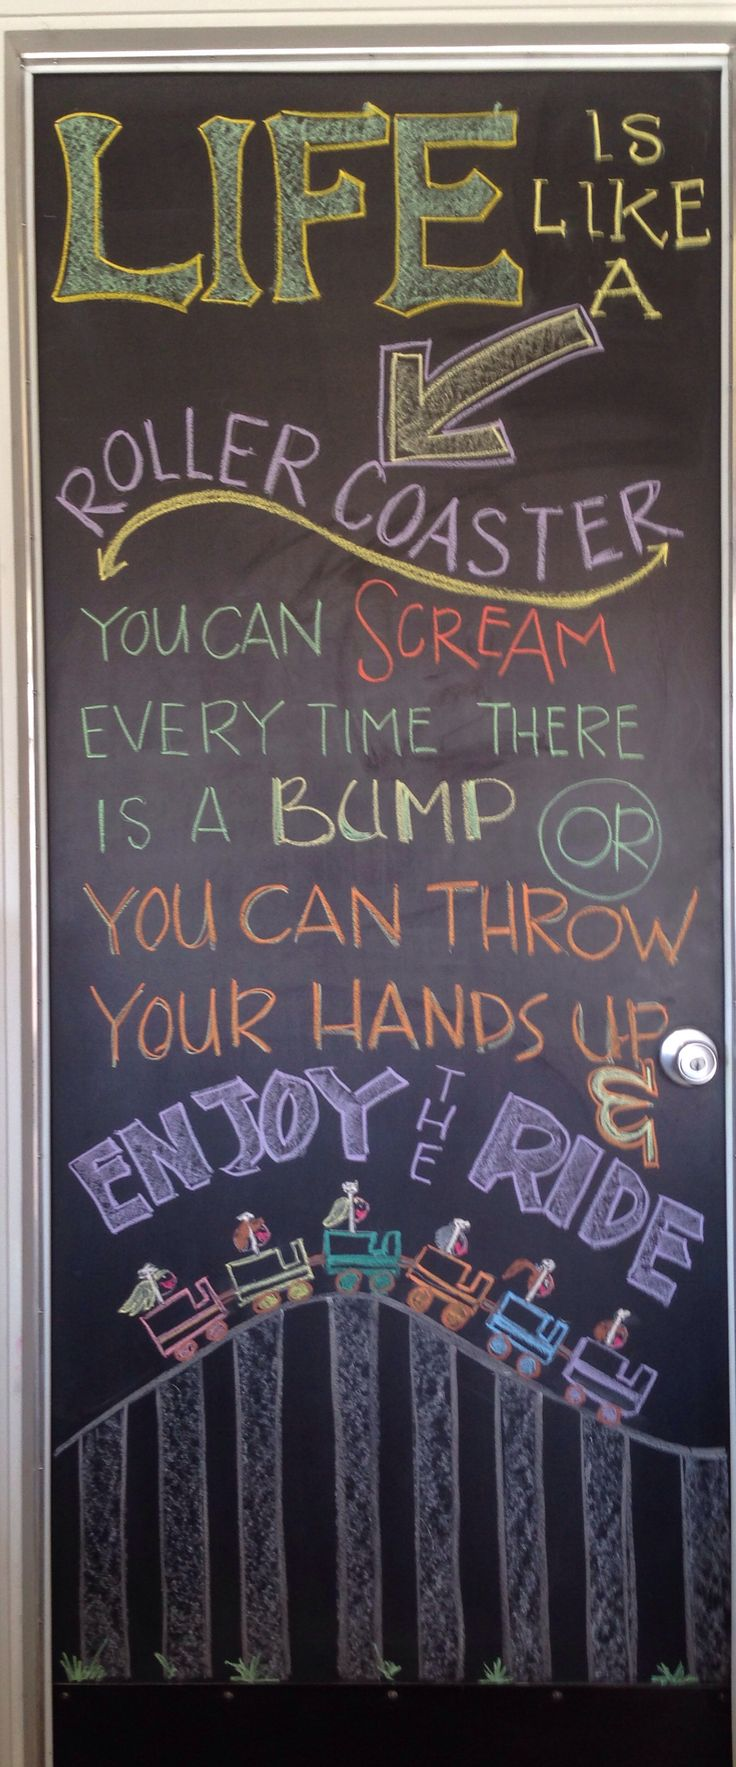 Life is a roller coaster chalkboard art 10-26-13